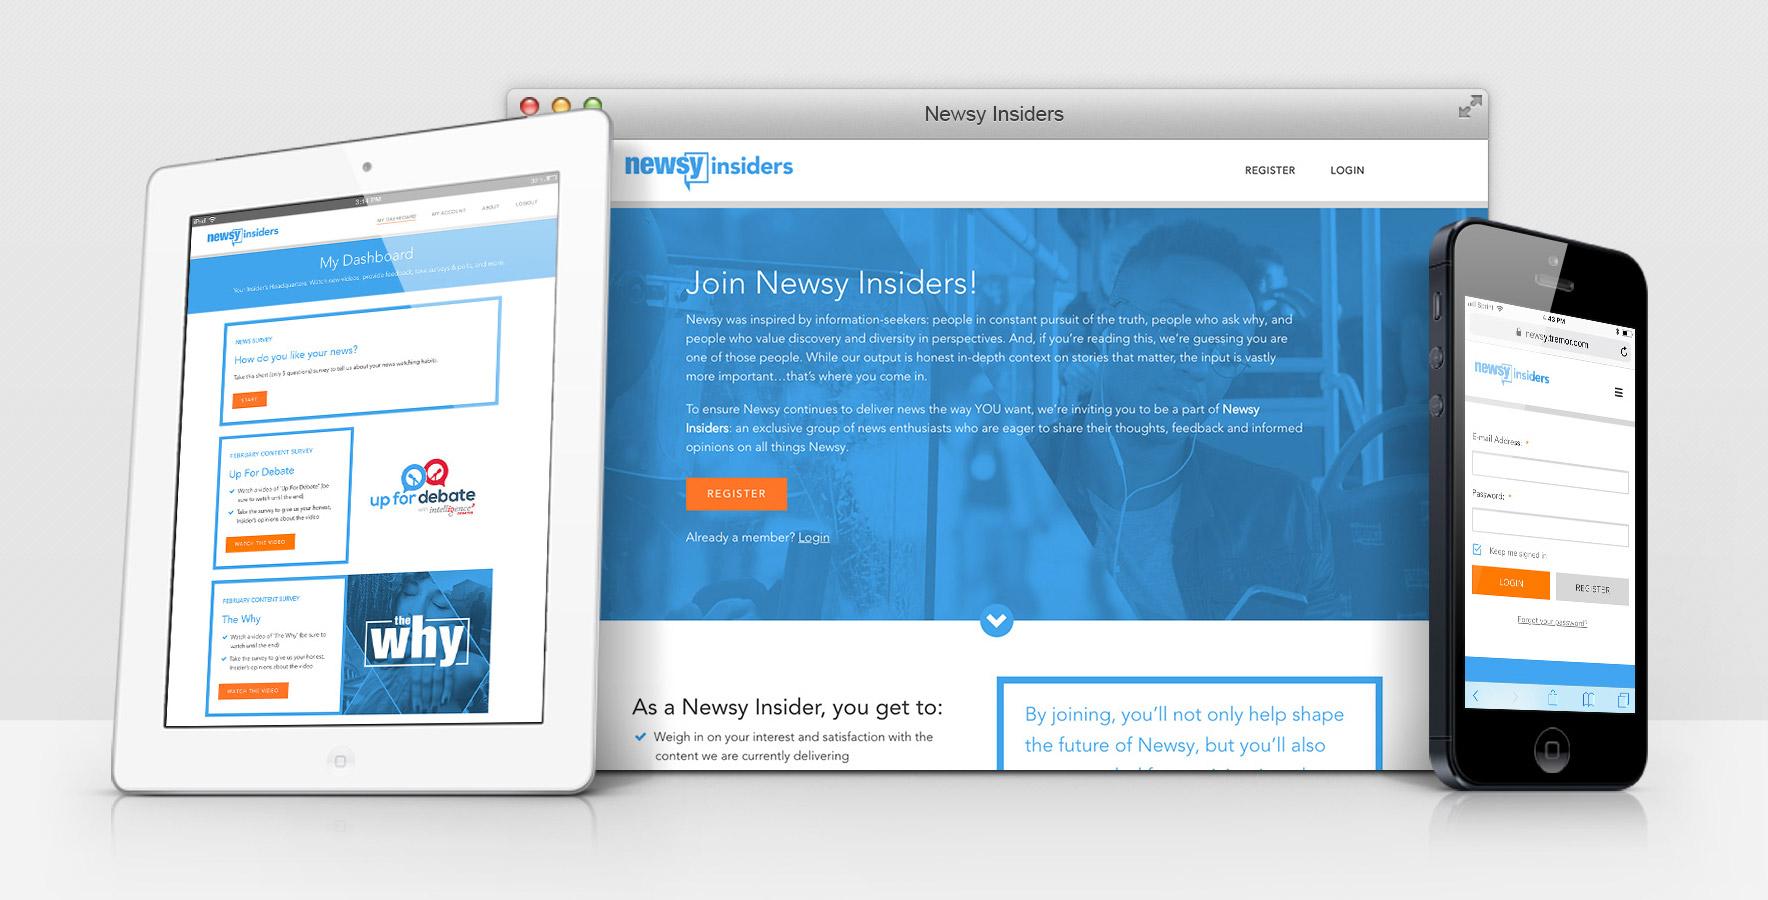 newsy-insiders-platform